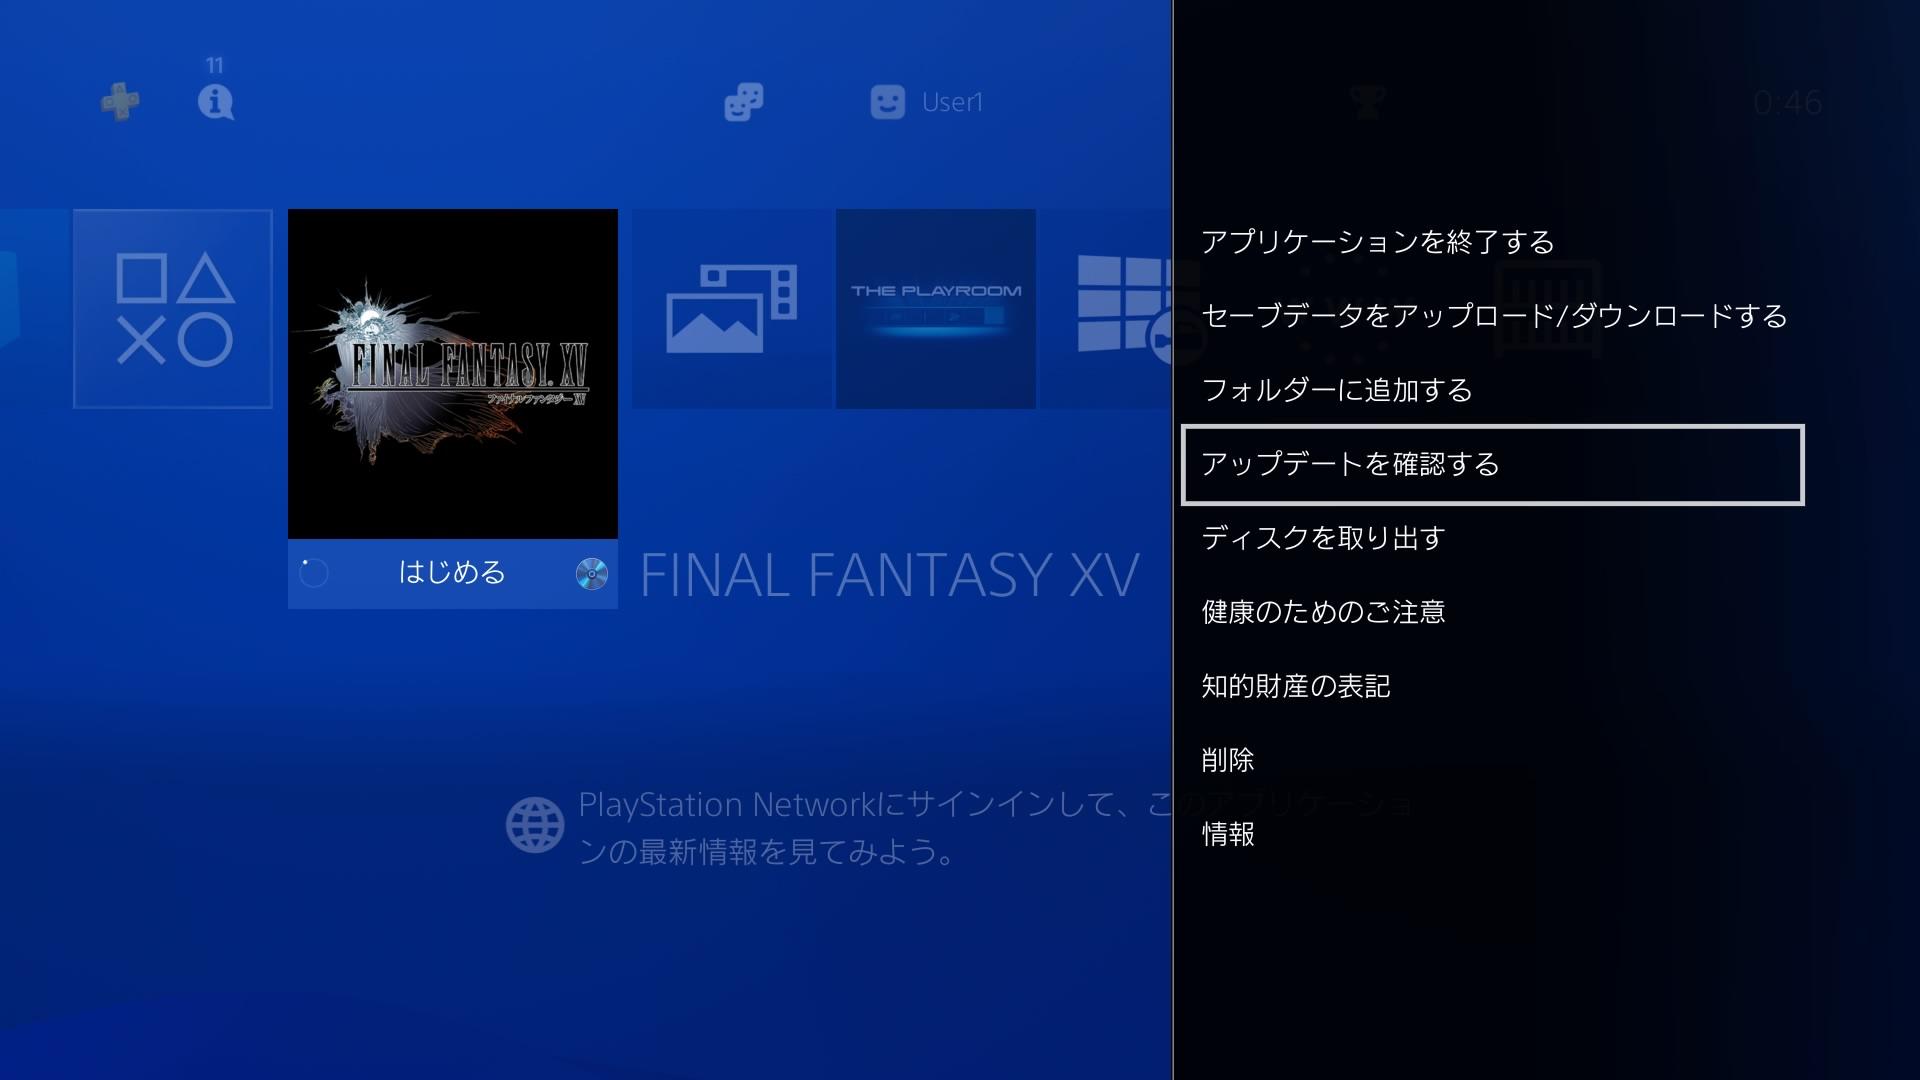 PS4でソフトアップデートを行う方法